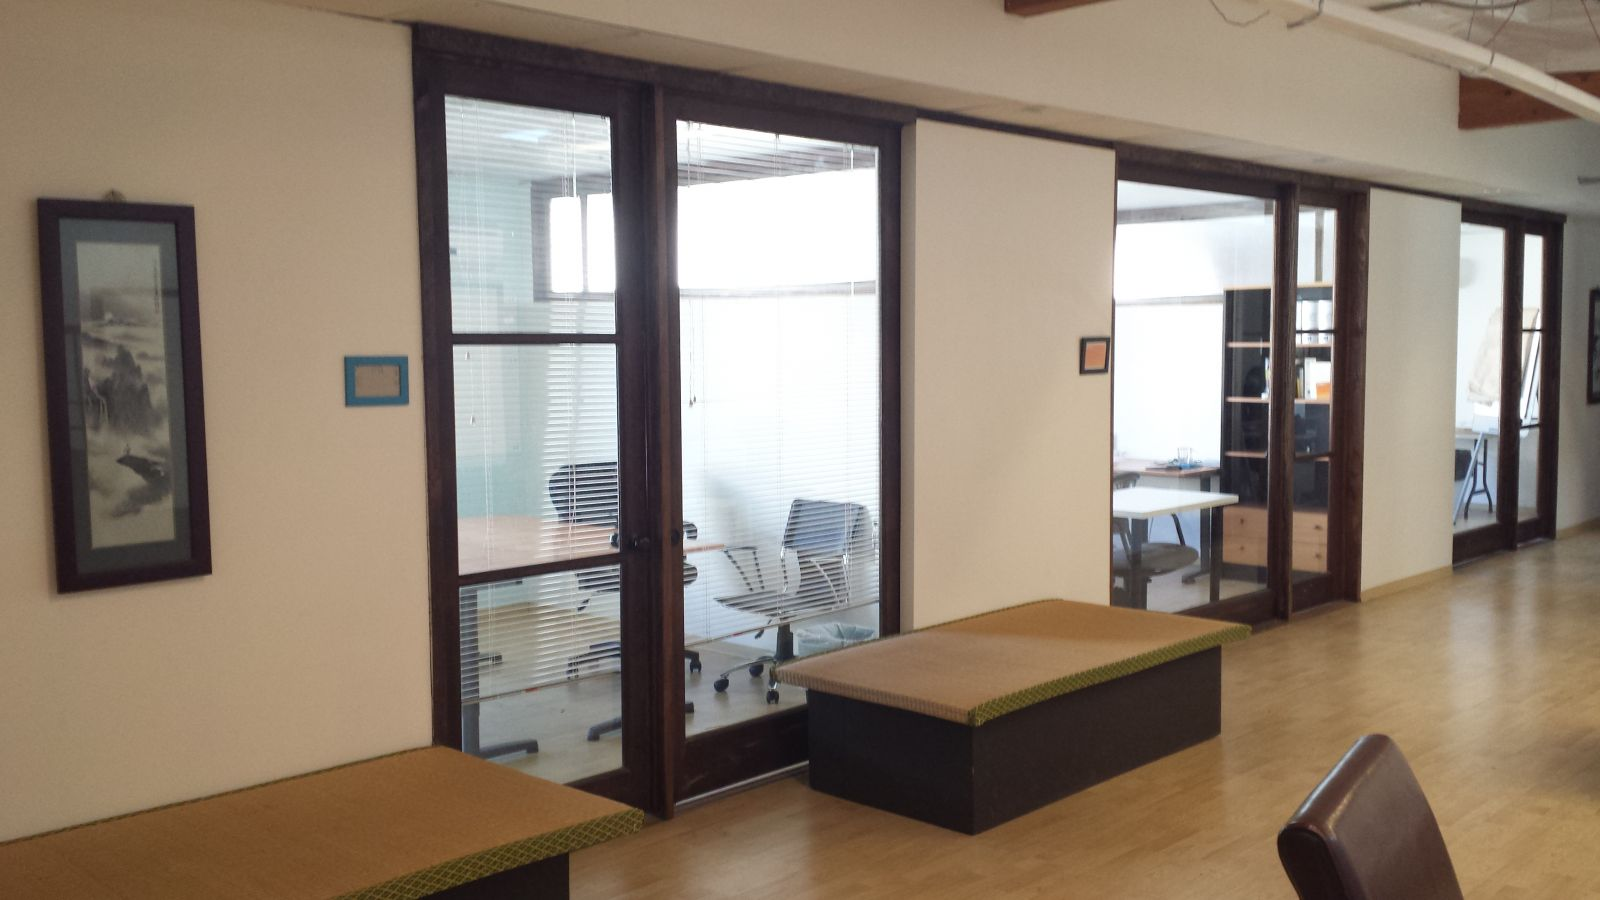 Ansir Innovation Center, San Diego